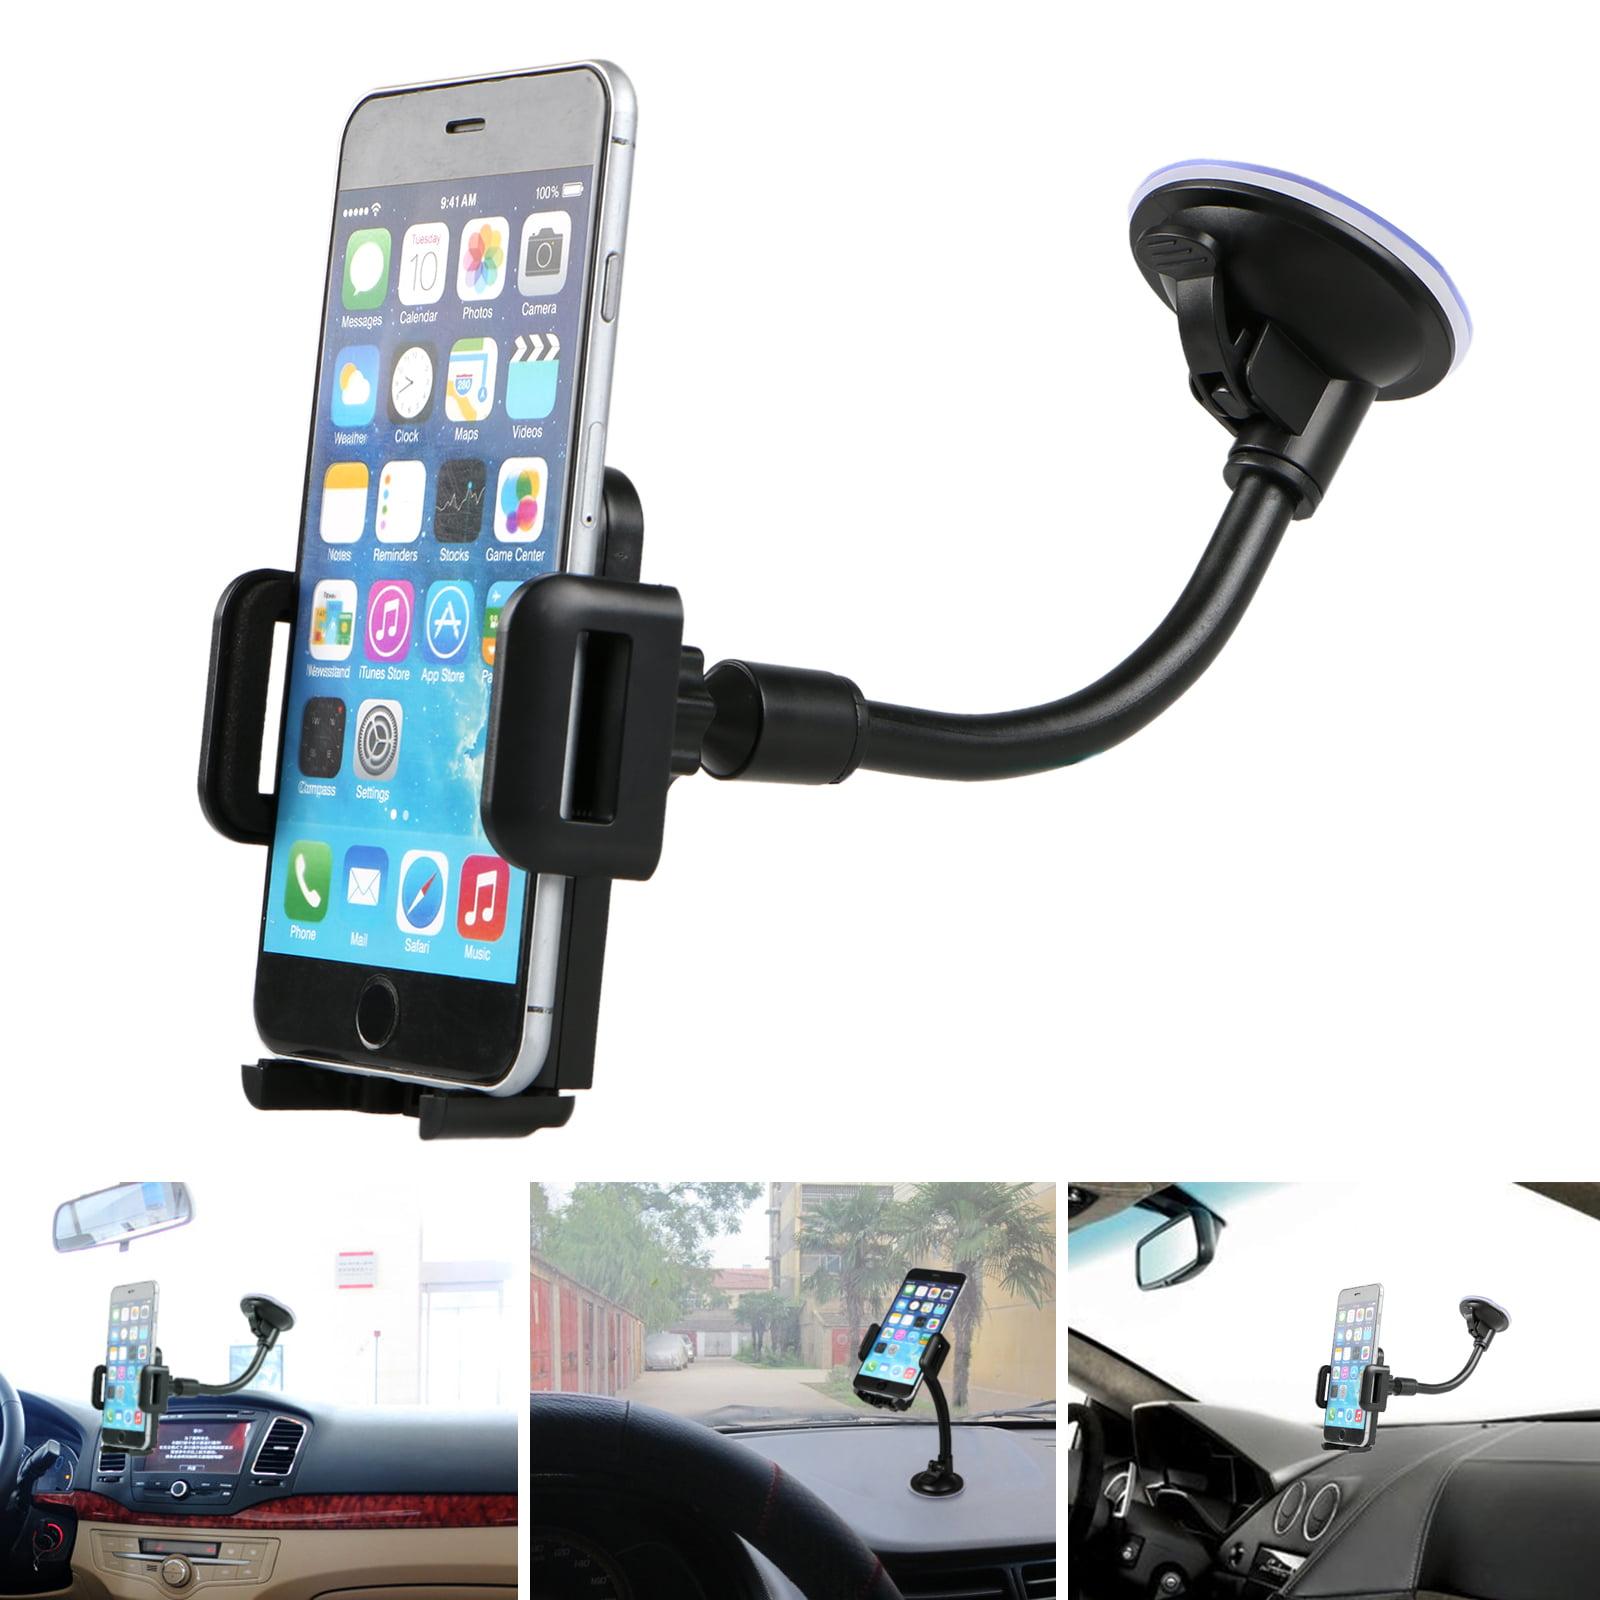 1x Universal Gravity Car Dash Mount Mobile Phone GPS Holder Cradle Accurate-Lock